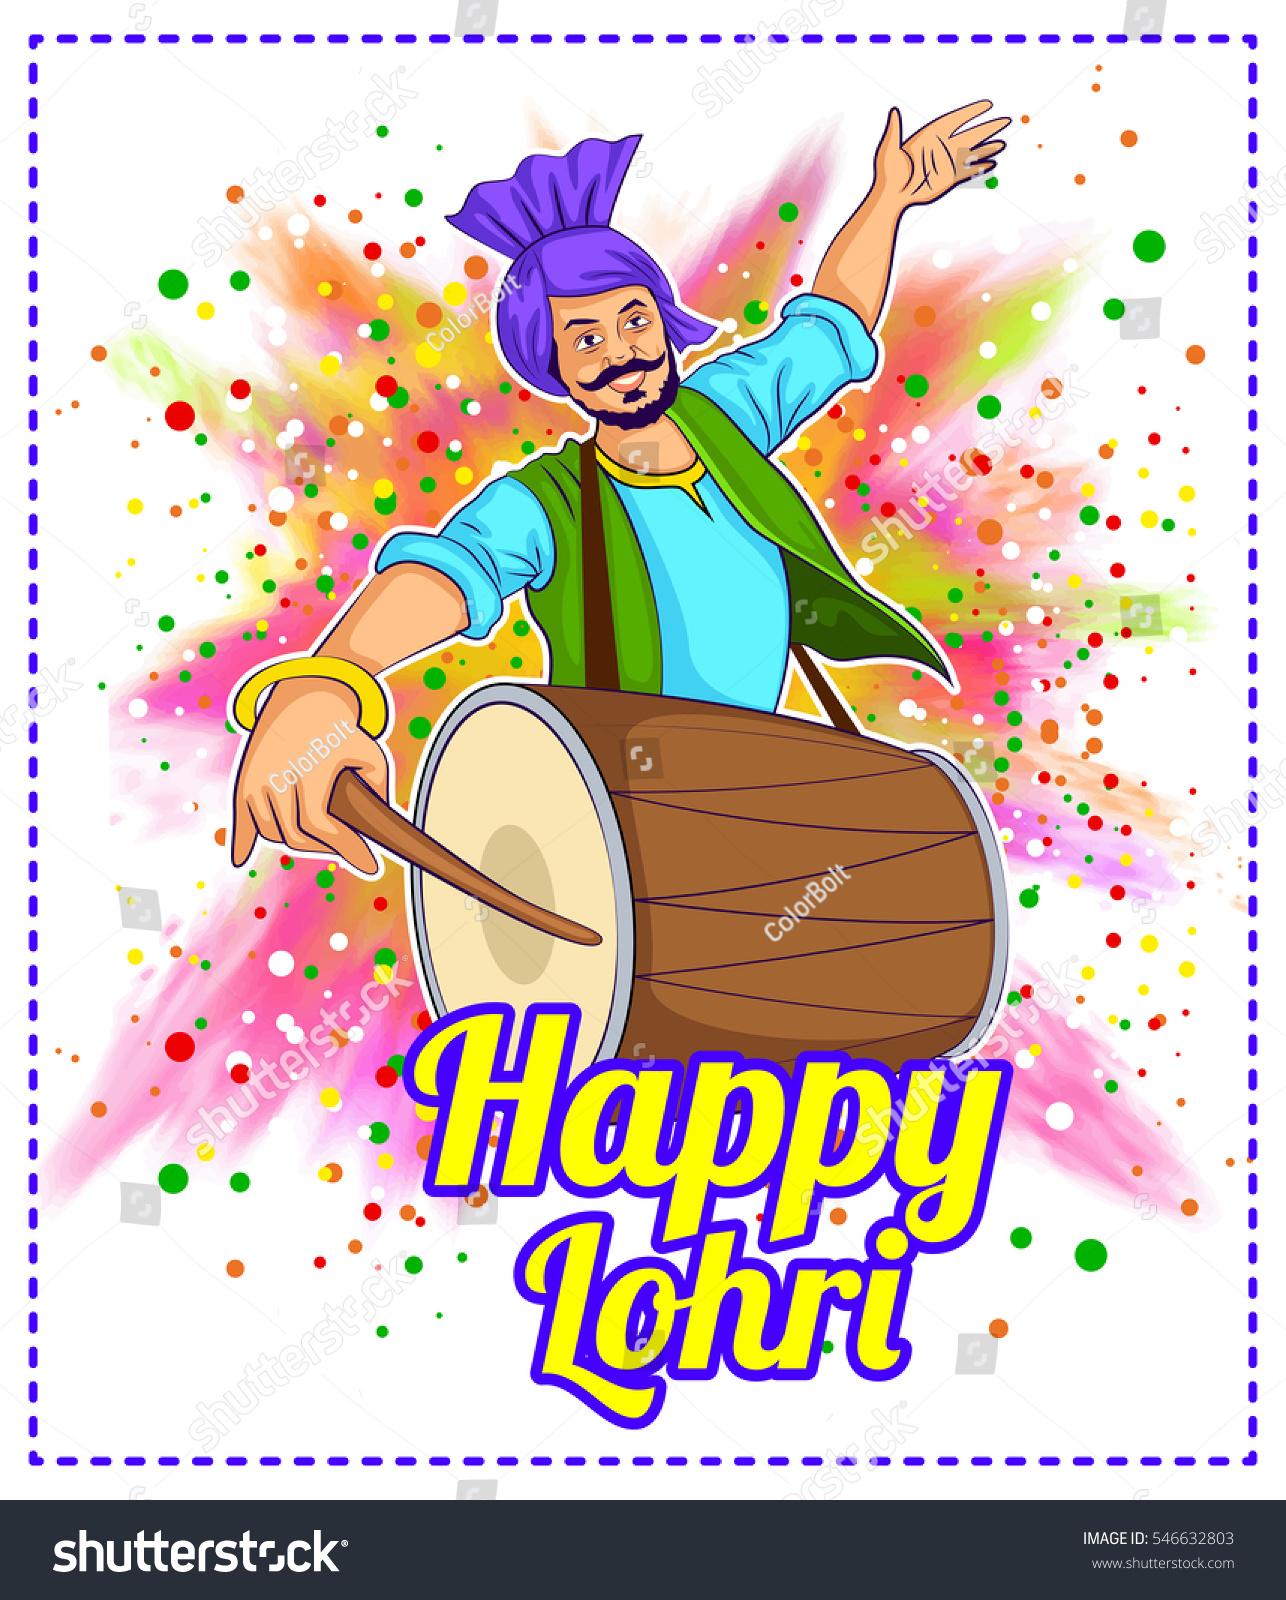 Happy Lohri Clipart.